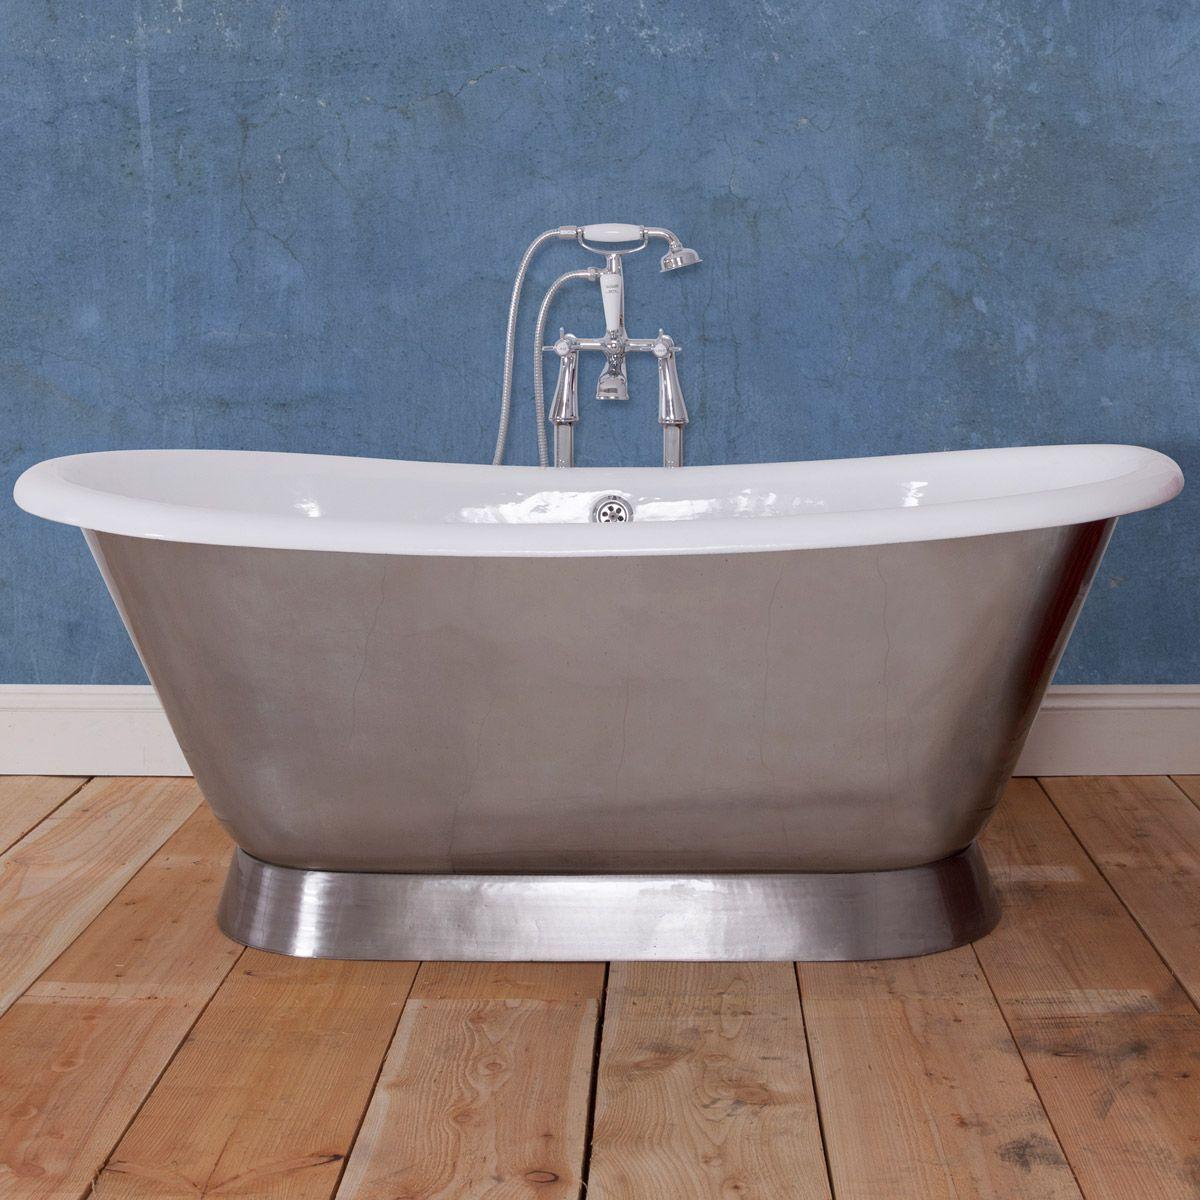 The Bath Co. Stirling polished cast iron bath | Stirling, Bath and Iron